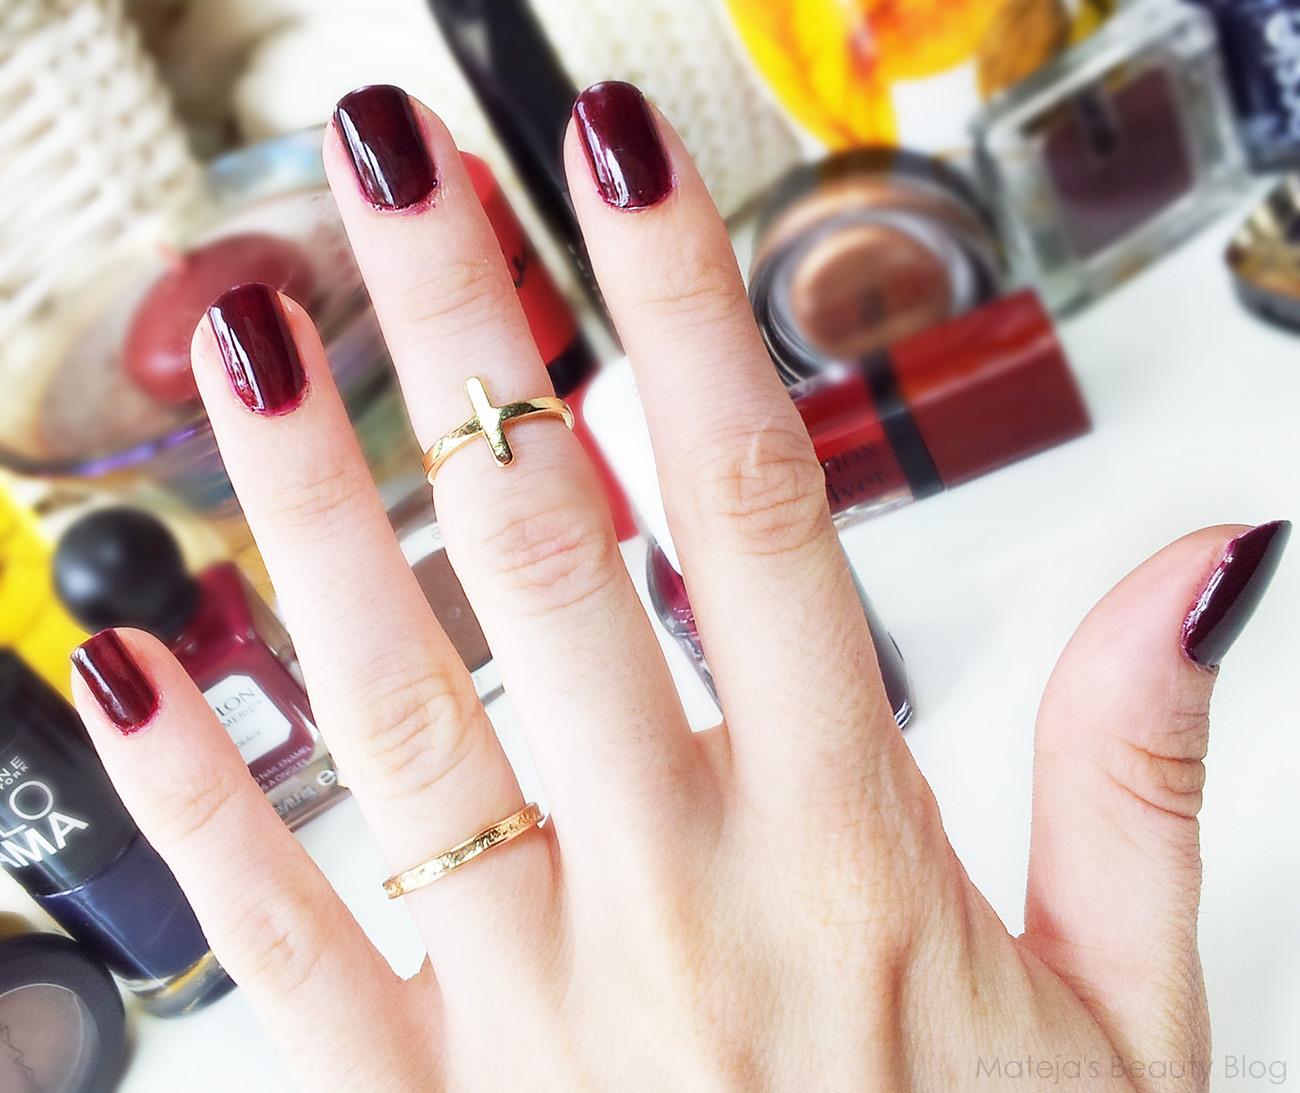 Essie Sole Mate - Mateja\'s Beauty Blog